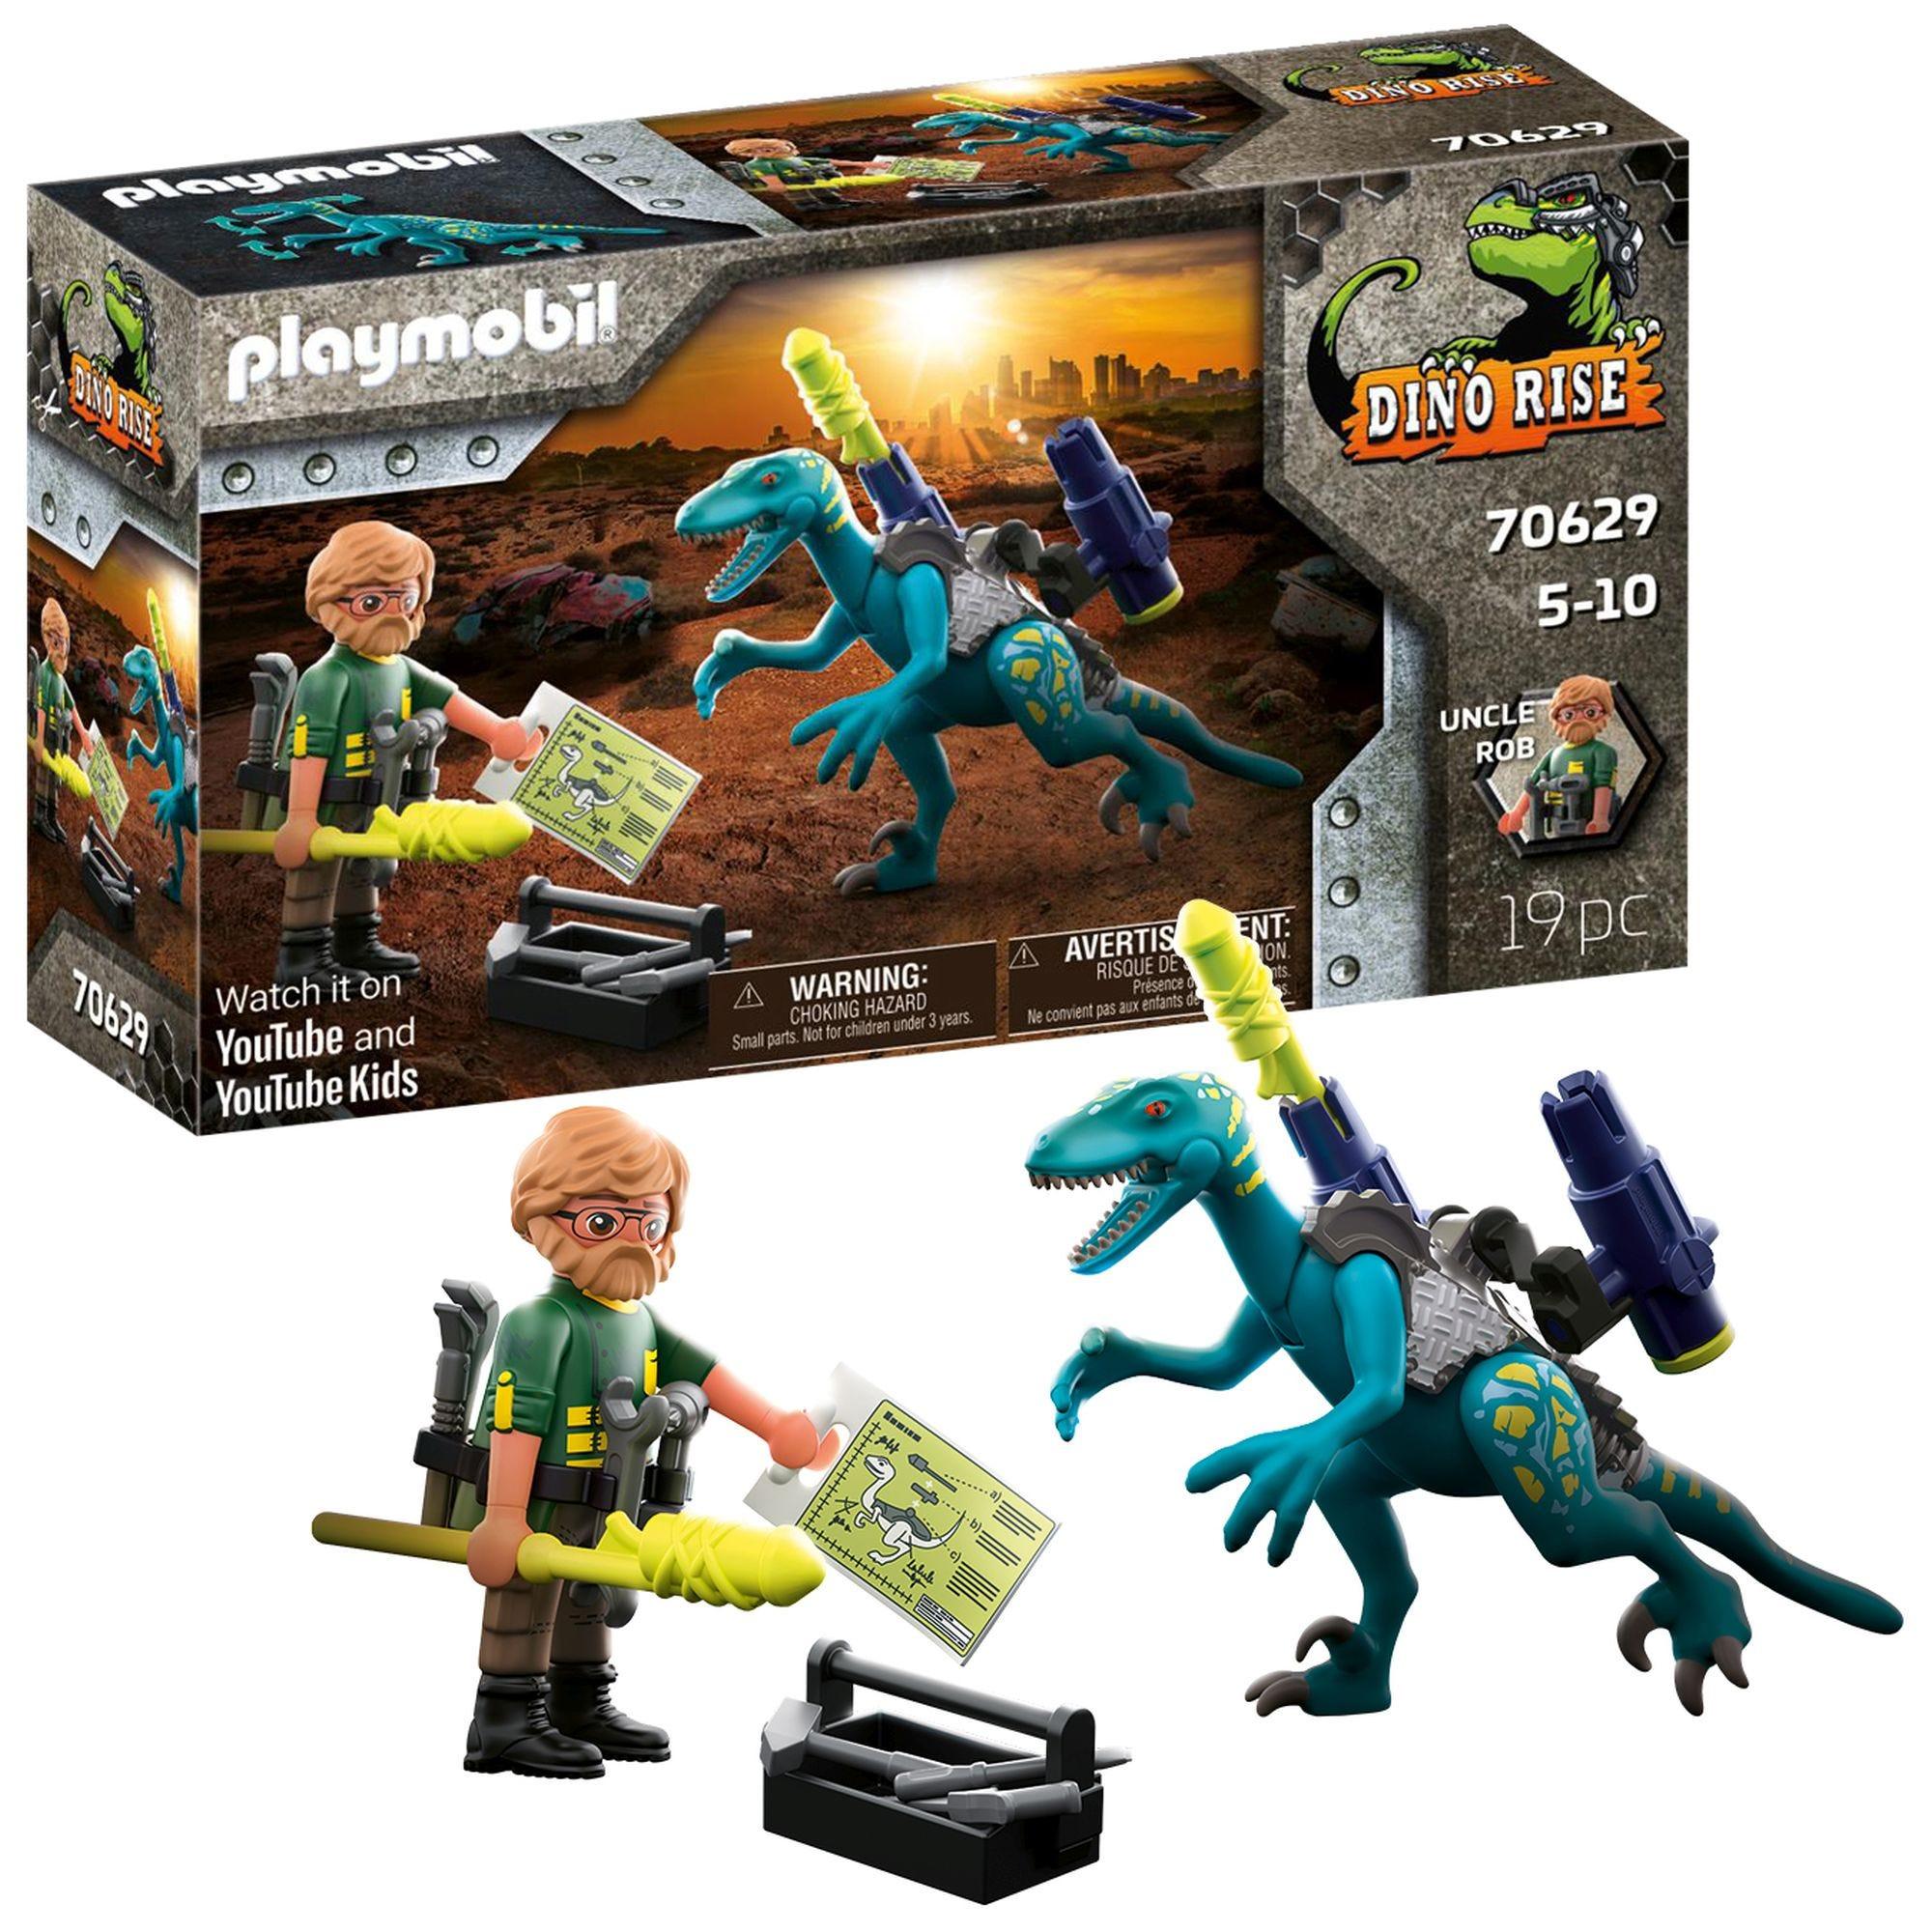 Playmobil 70629 Dino Rise Deinonychus: Ready for Battle